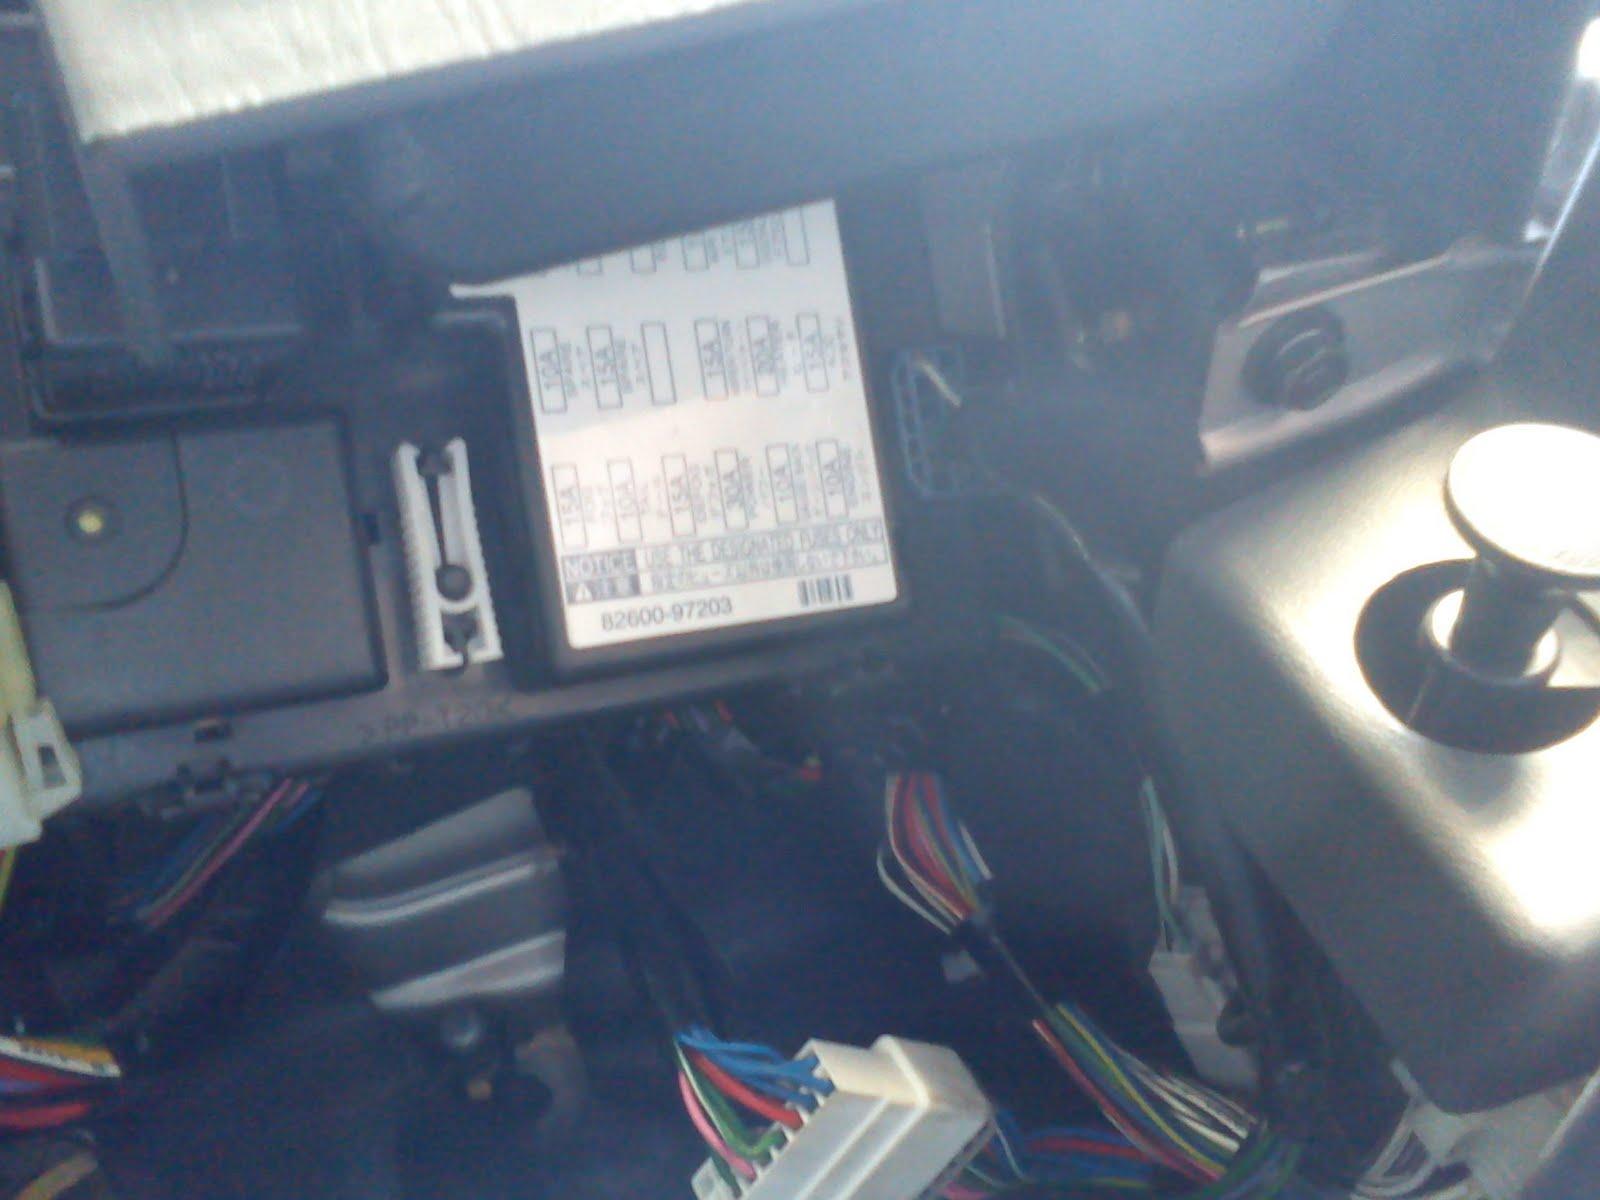 fuse box kancil 850 wiring diagram portal automotive fuse box kancil fuse box [ 1600 x 1200 Pixel ]